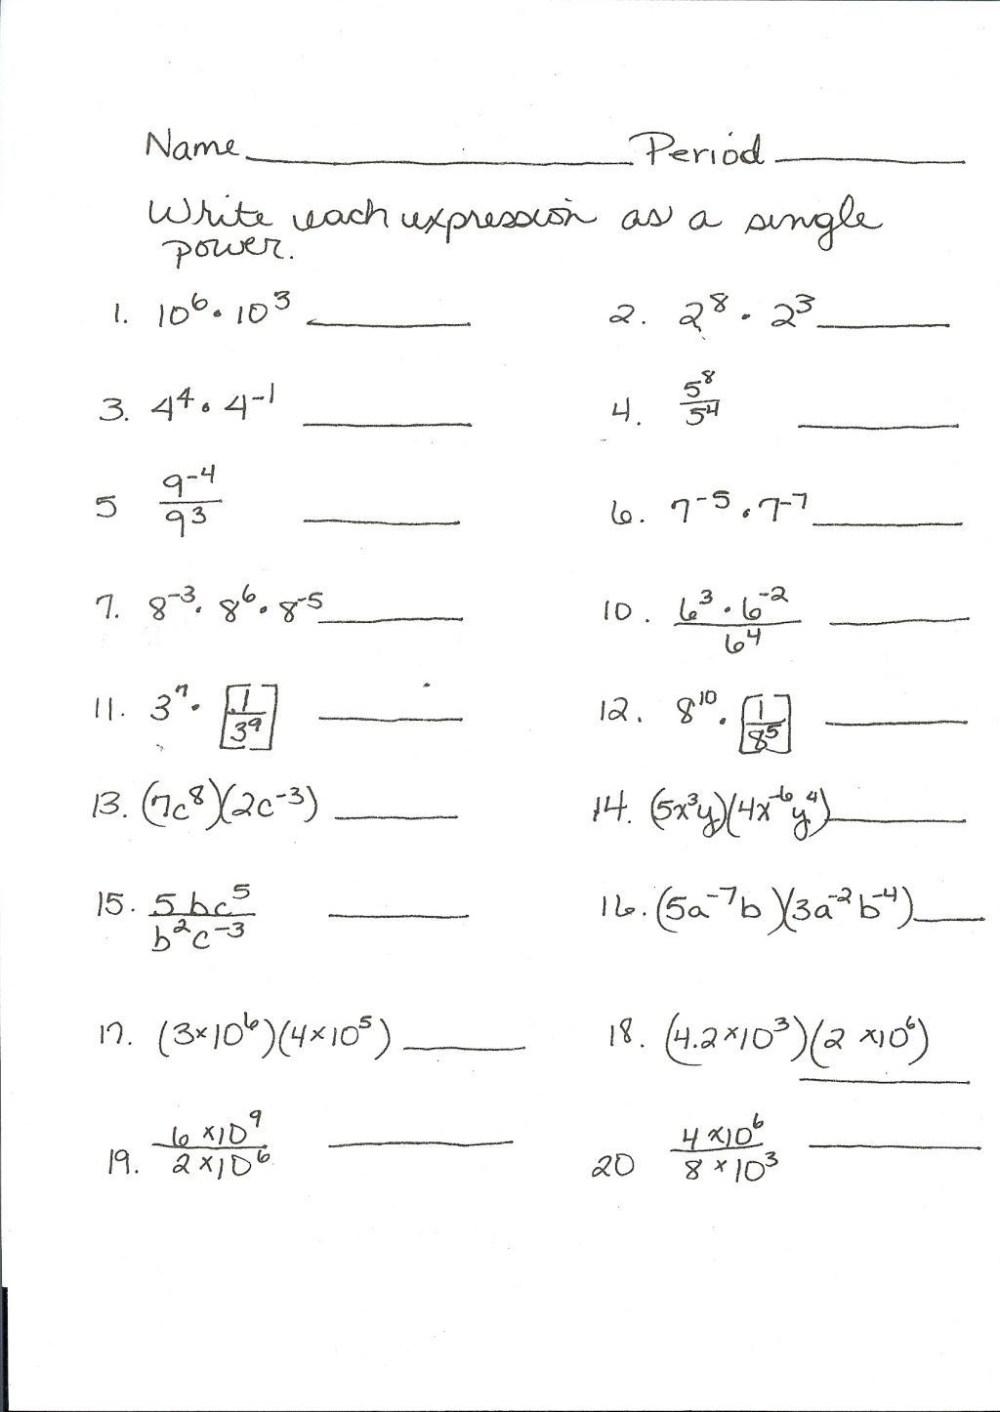 medium resolution of Staar Test Sample Worksheets   Printable Worksheets and Activities for  Teachers